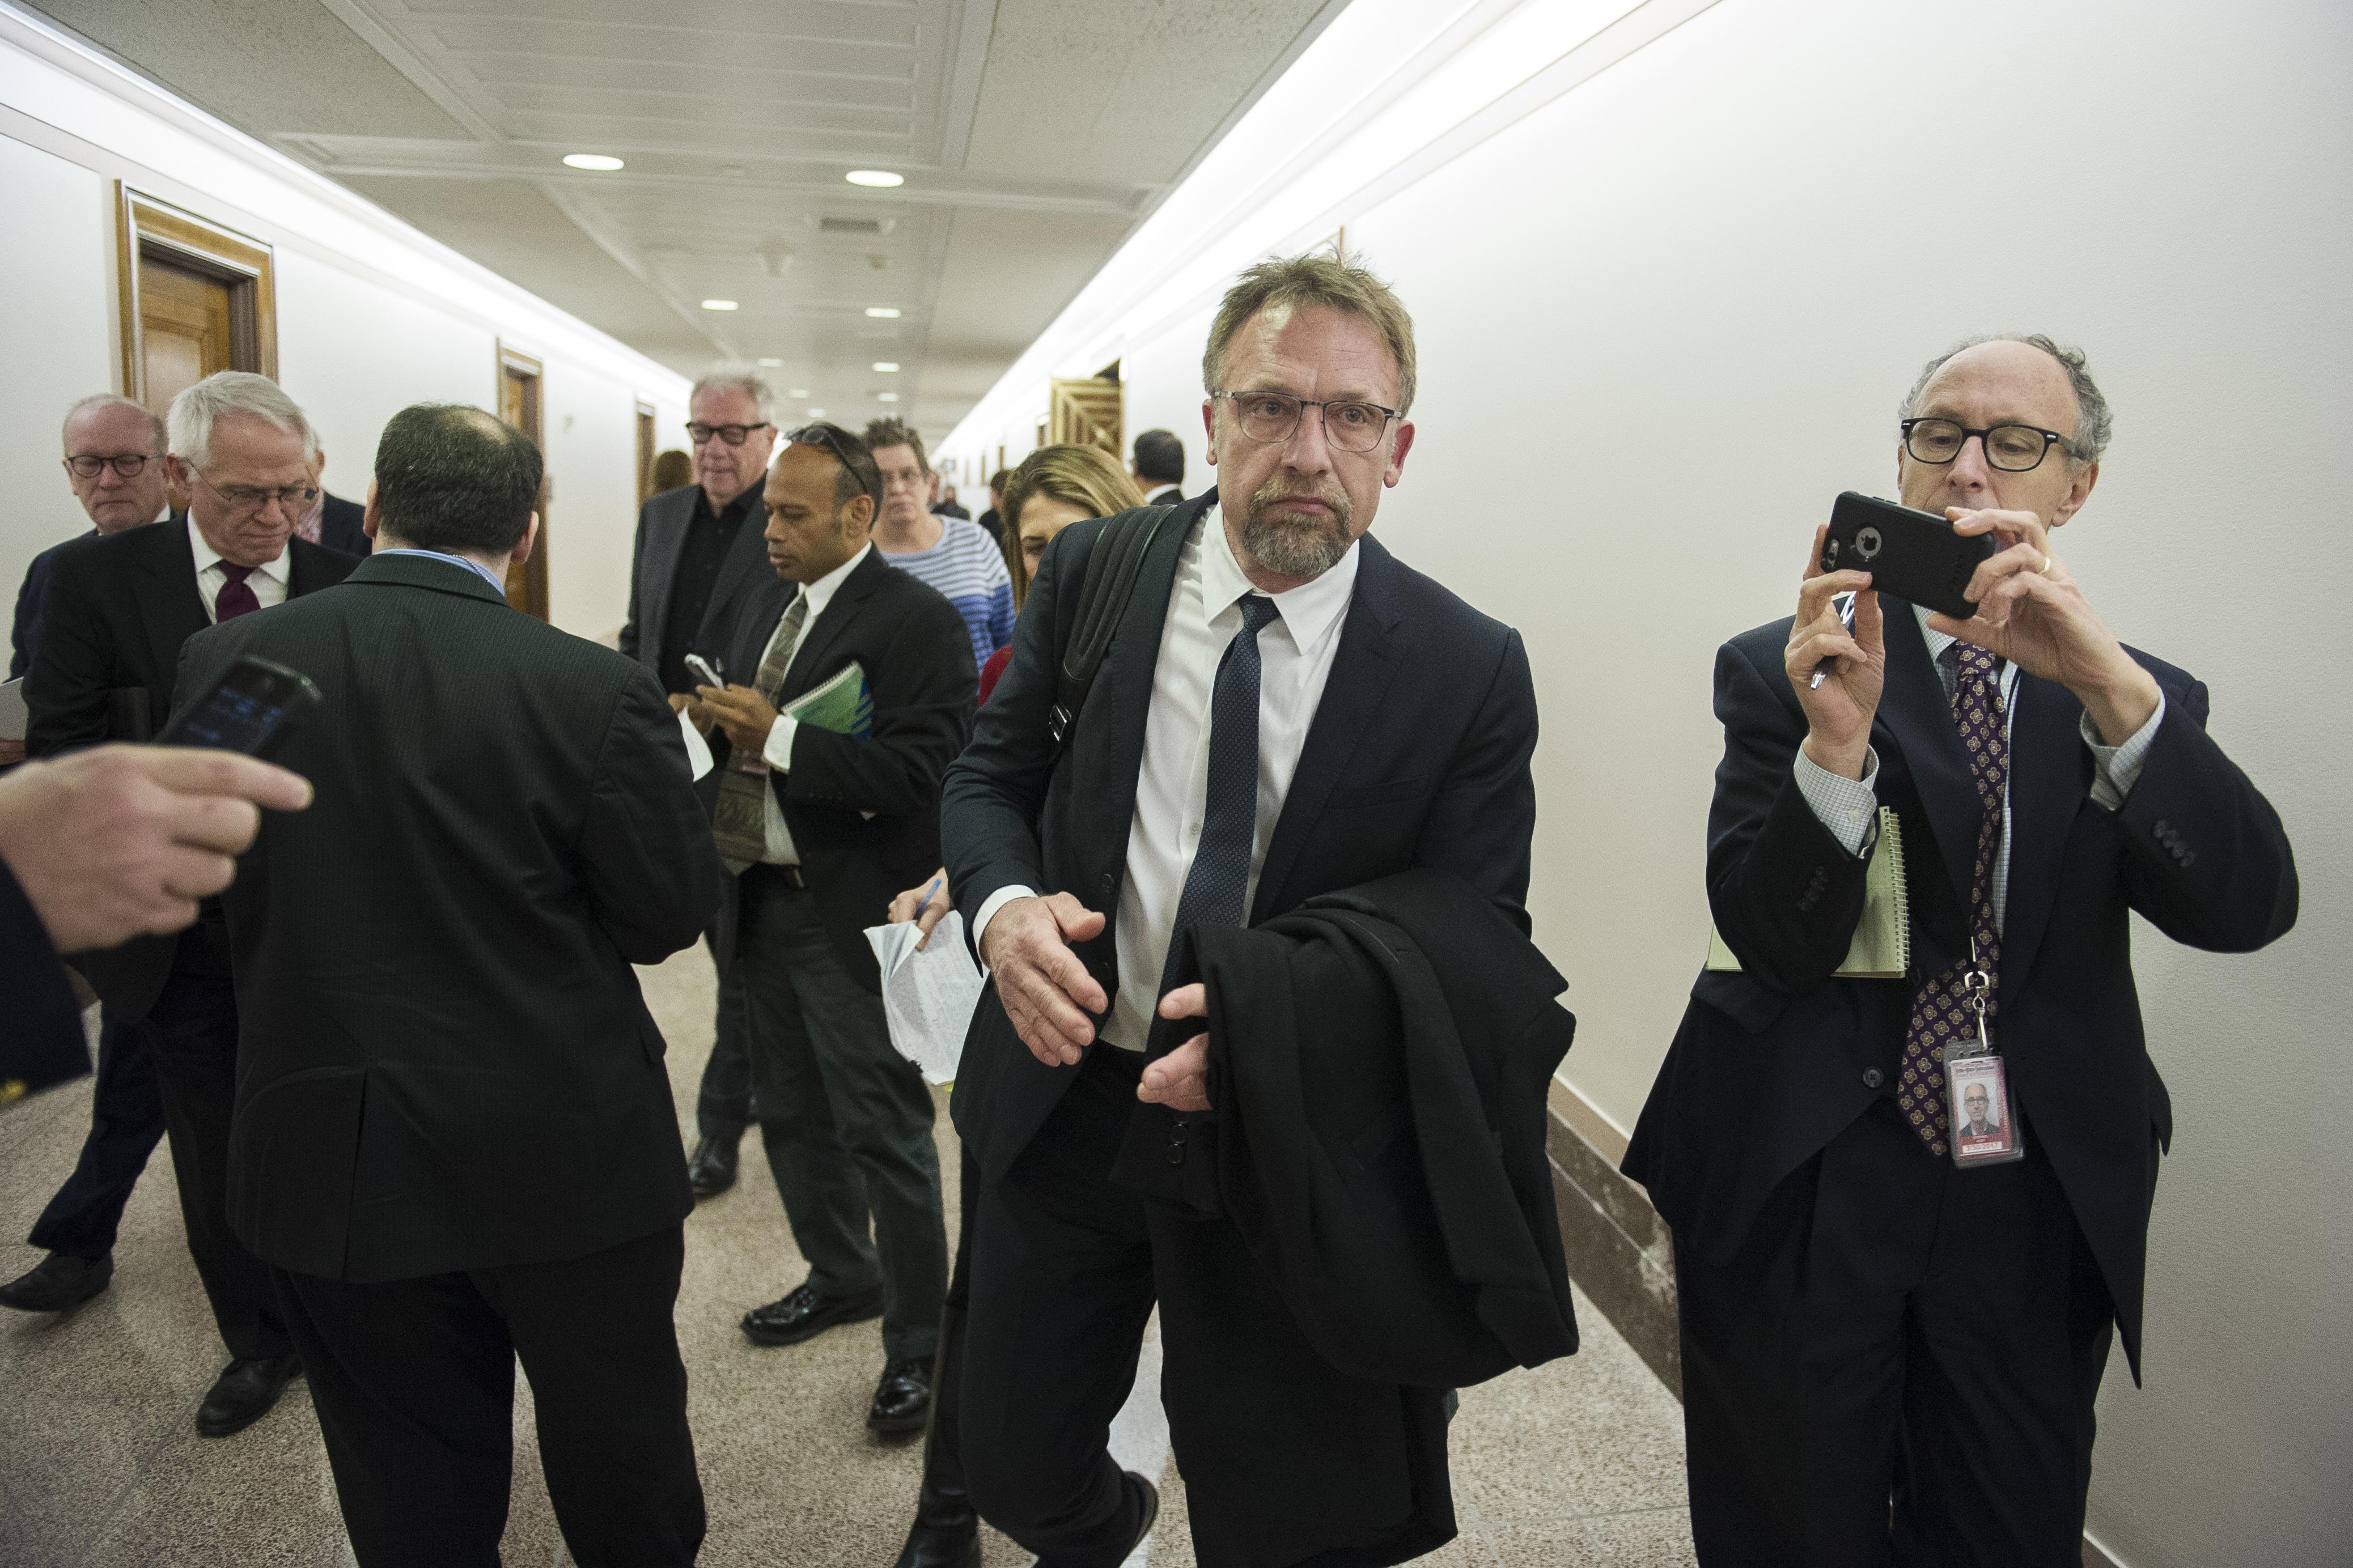 Carl Ferrer Backpage CEO mum on screening policies Washington Times